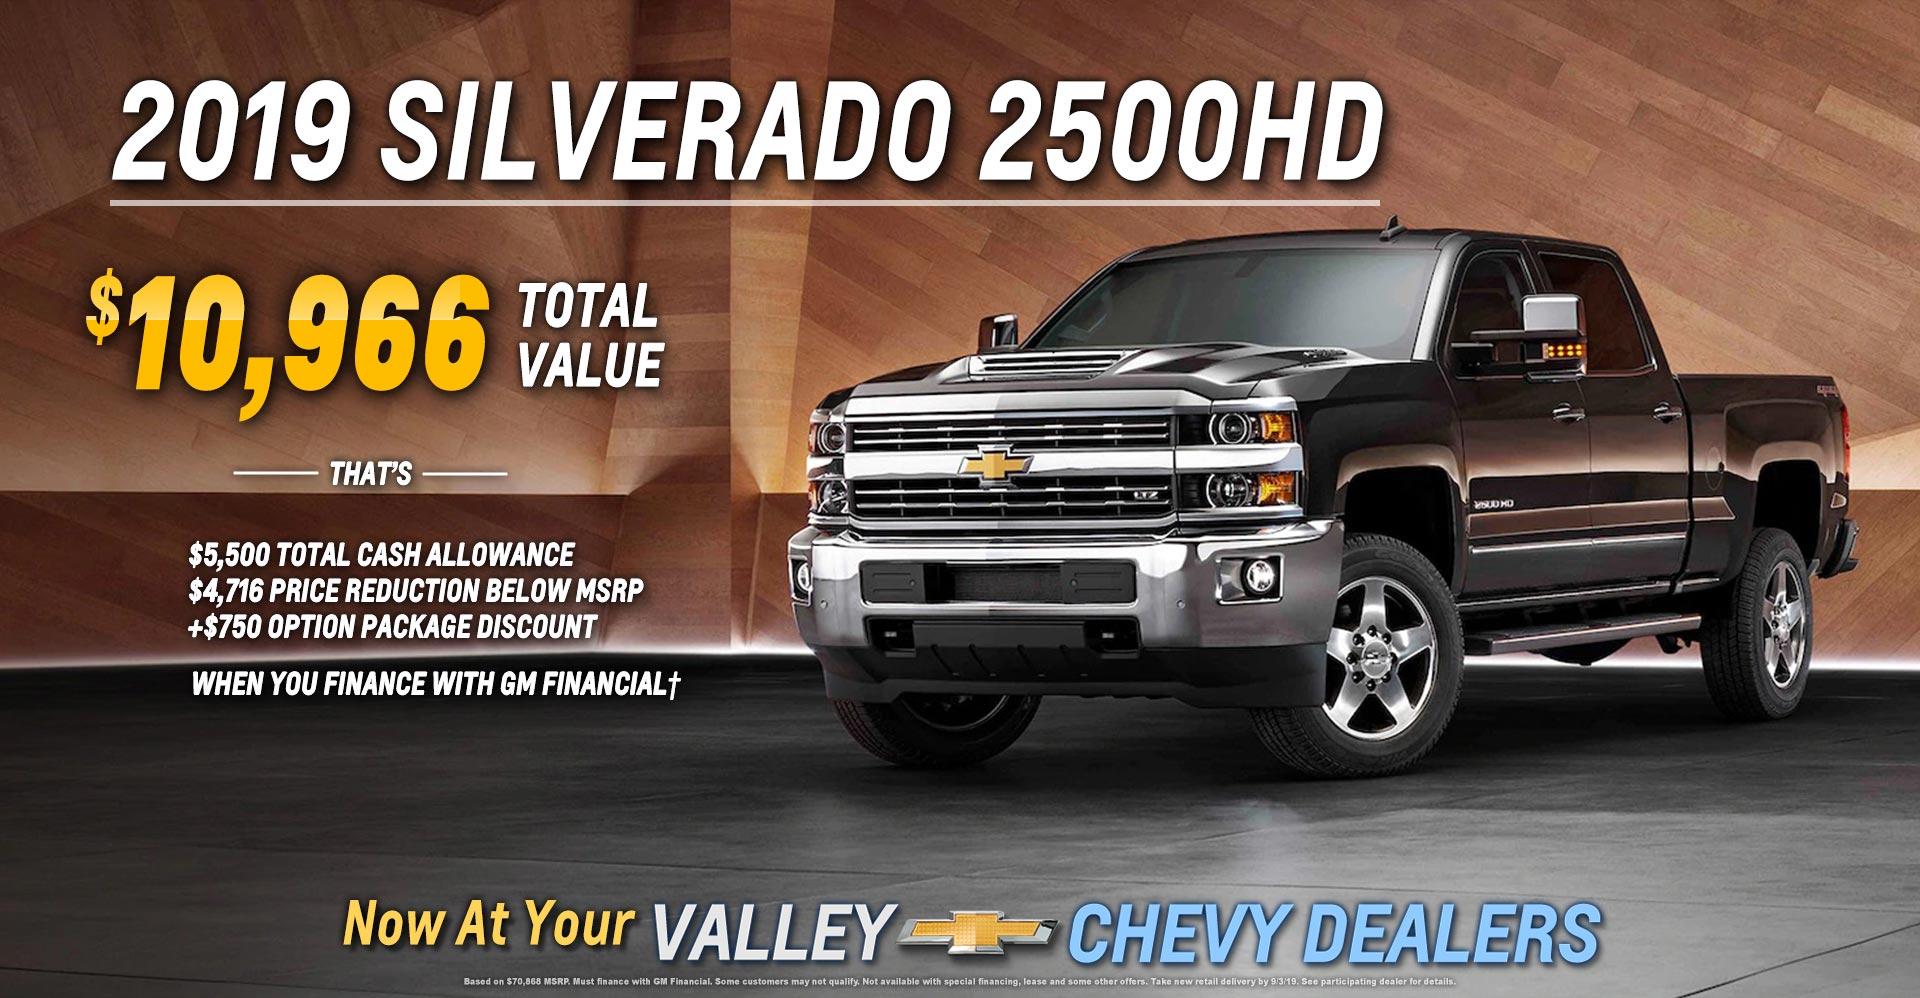 Silverado 2500HD to August 12